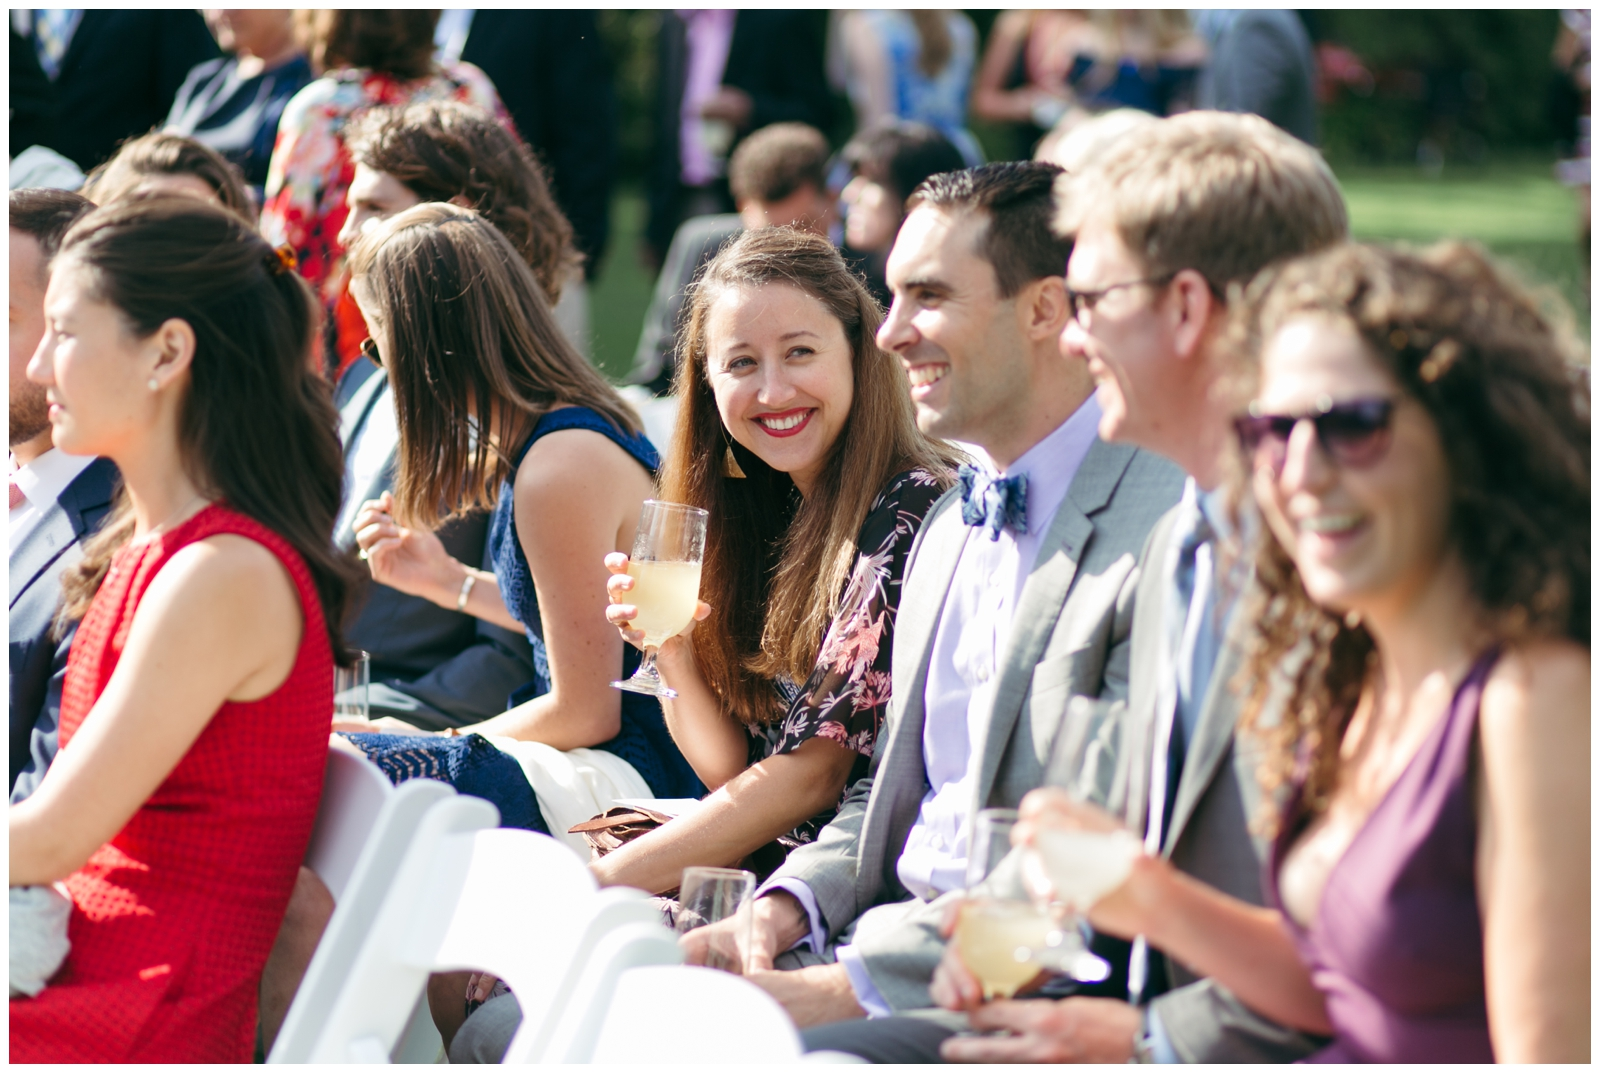 Moraine-Farm-wedding-Bailey-Q-Photo-Massachusetts-wedding-photpgrapher-053.jpg